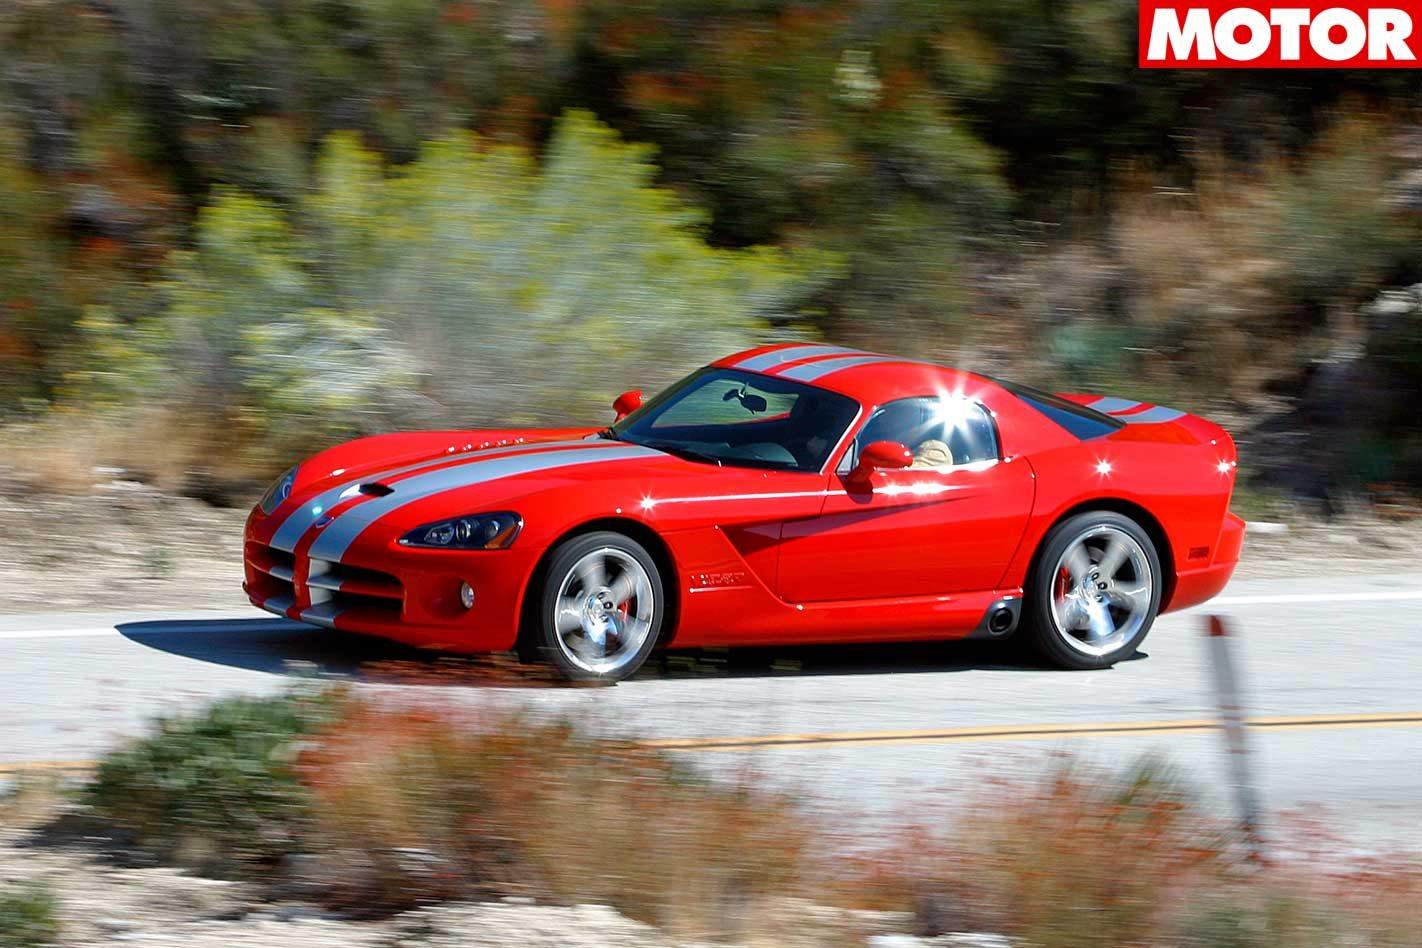 2006 dodge viper srt10 coupe review classic motor. Black Bedroom Furniture Sets. Home Design Ideas